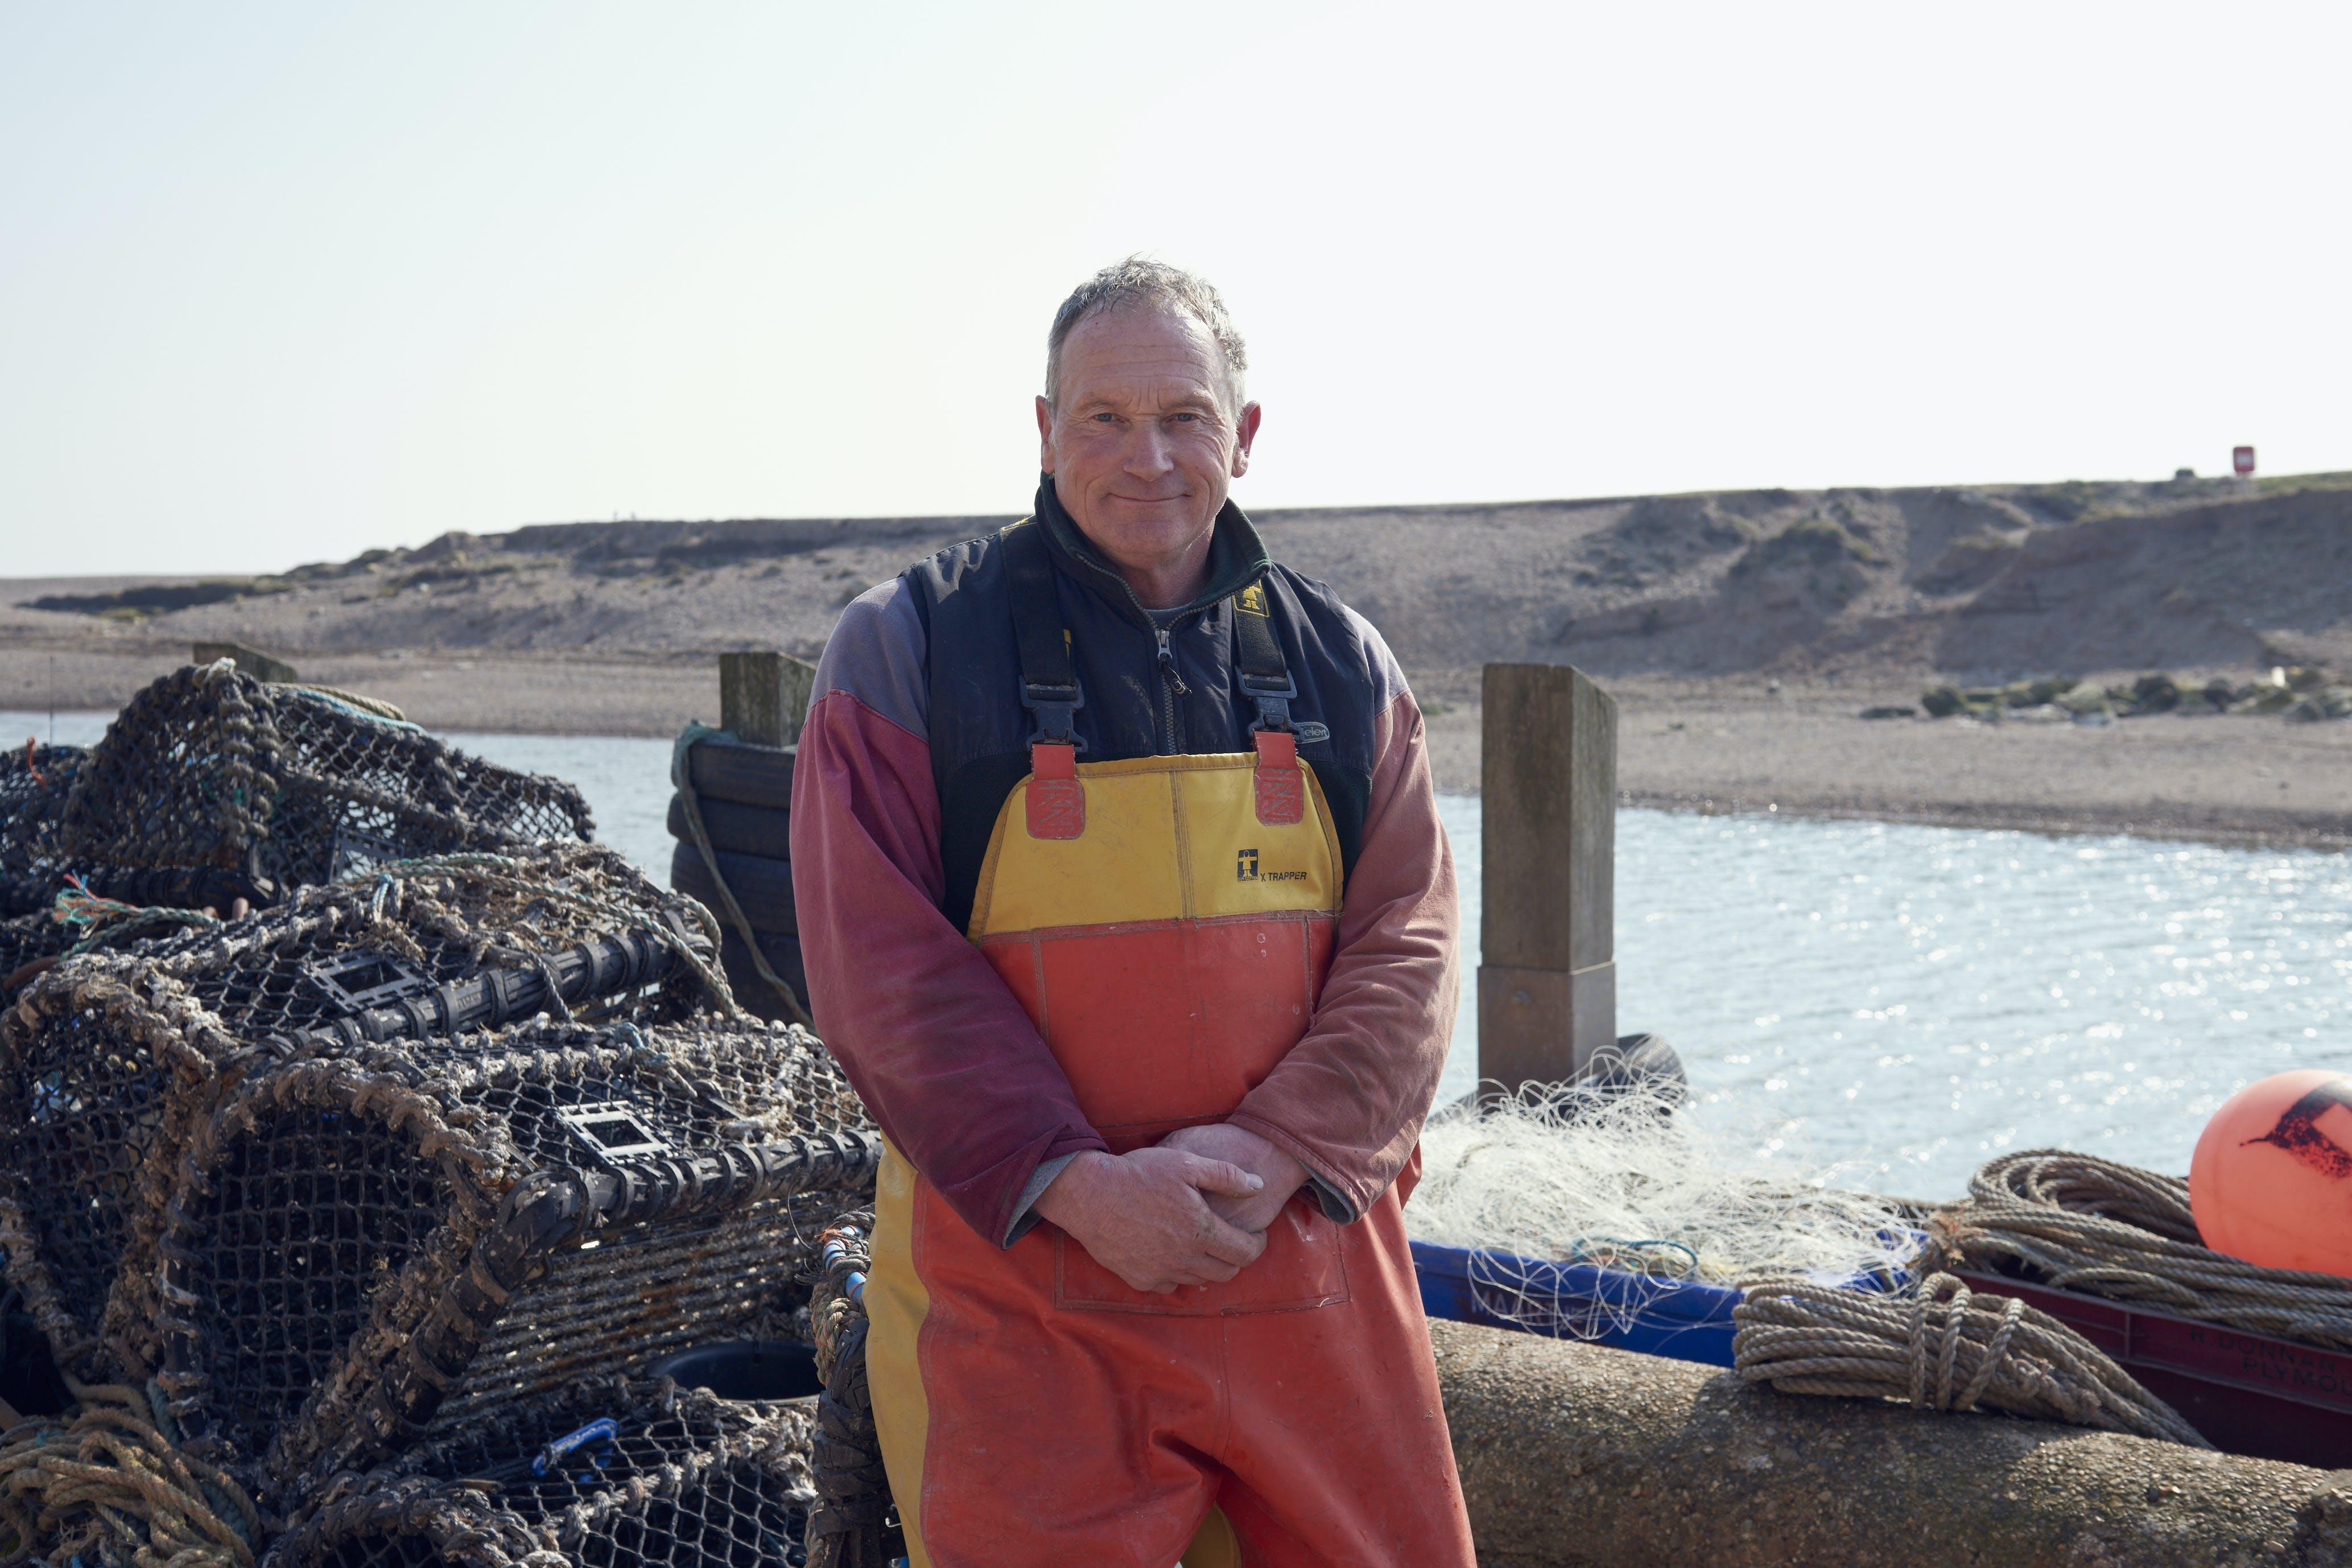 Farmdrop Fisherman - Farmdrop Local Food Delivery